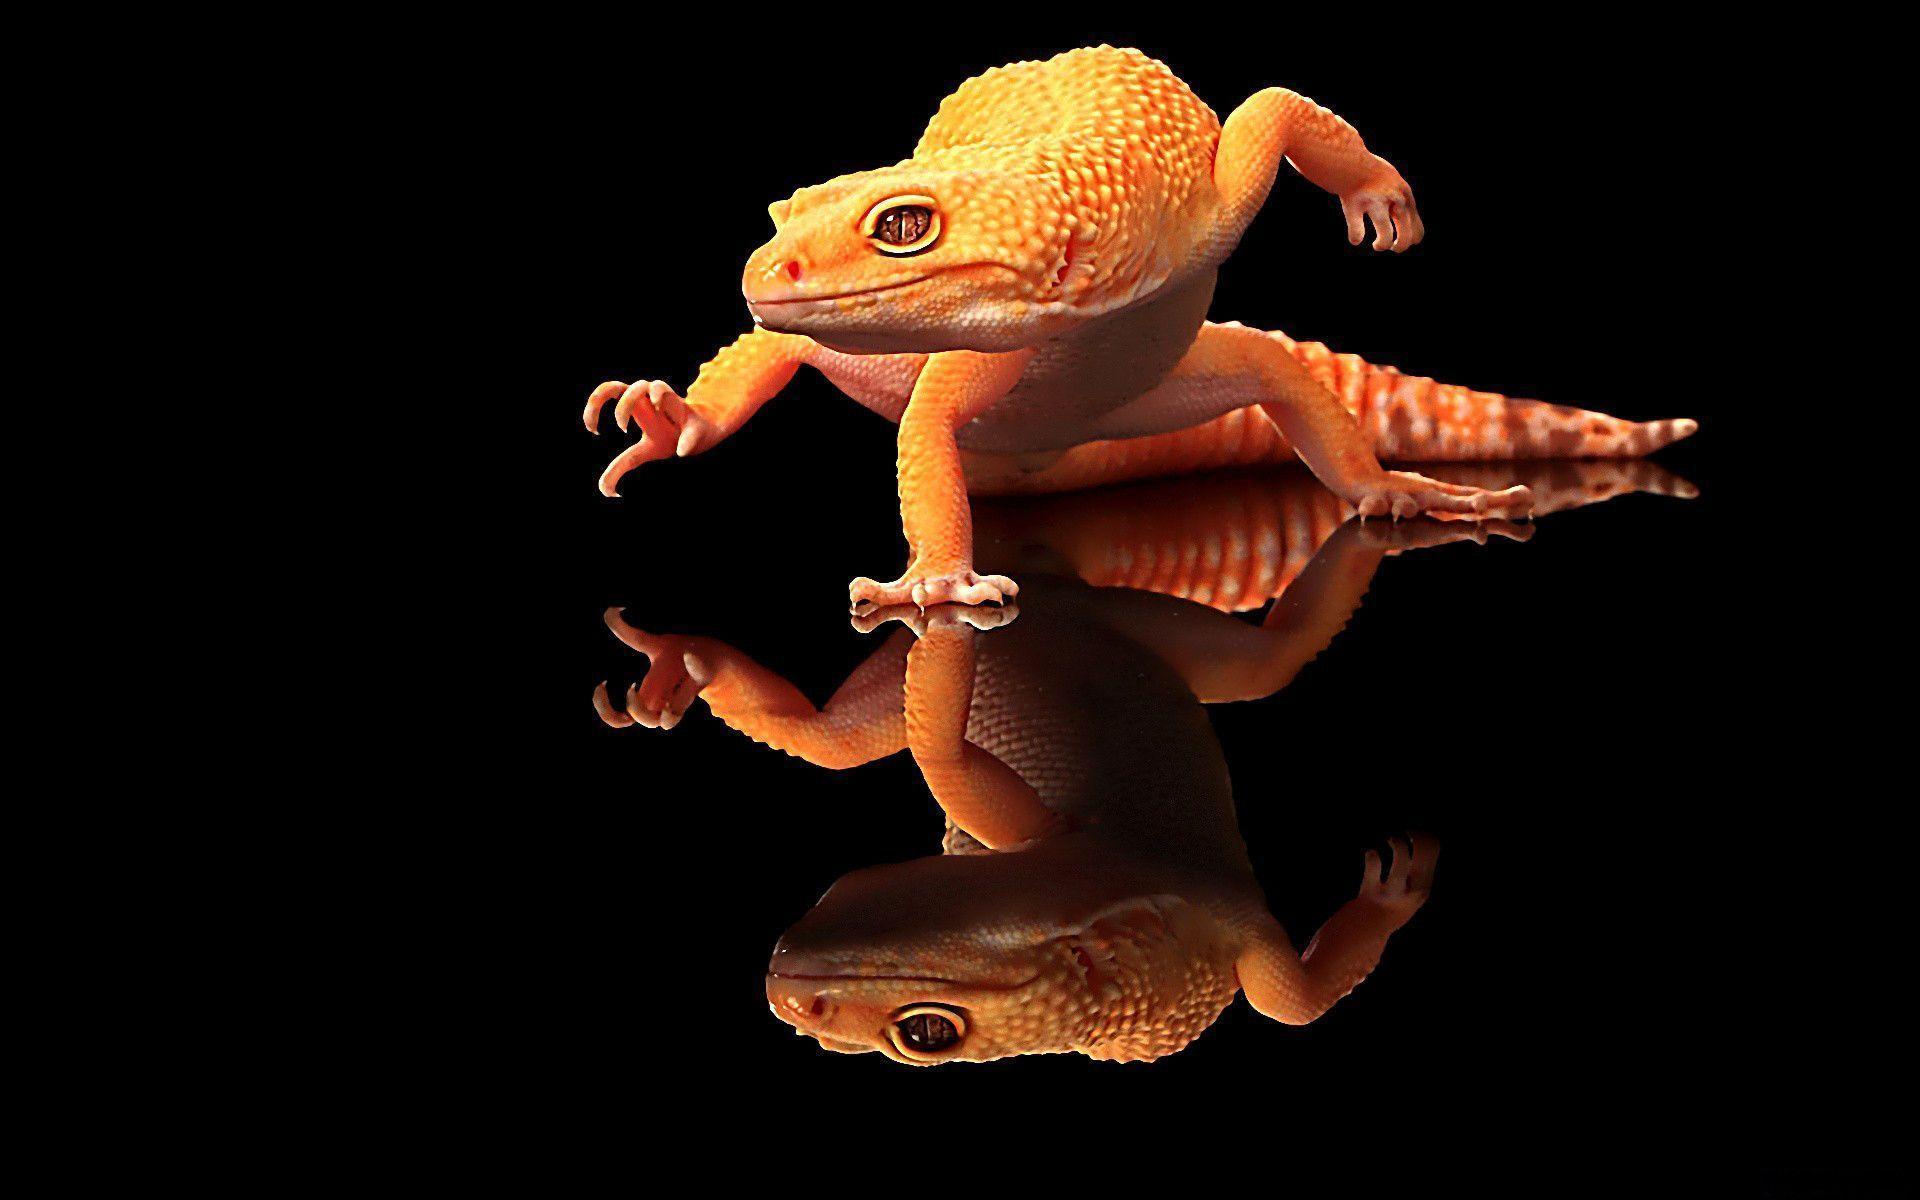 amazing Gecko Wallpaper